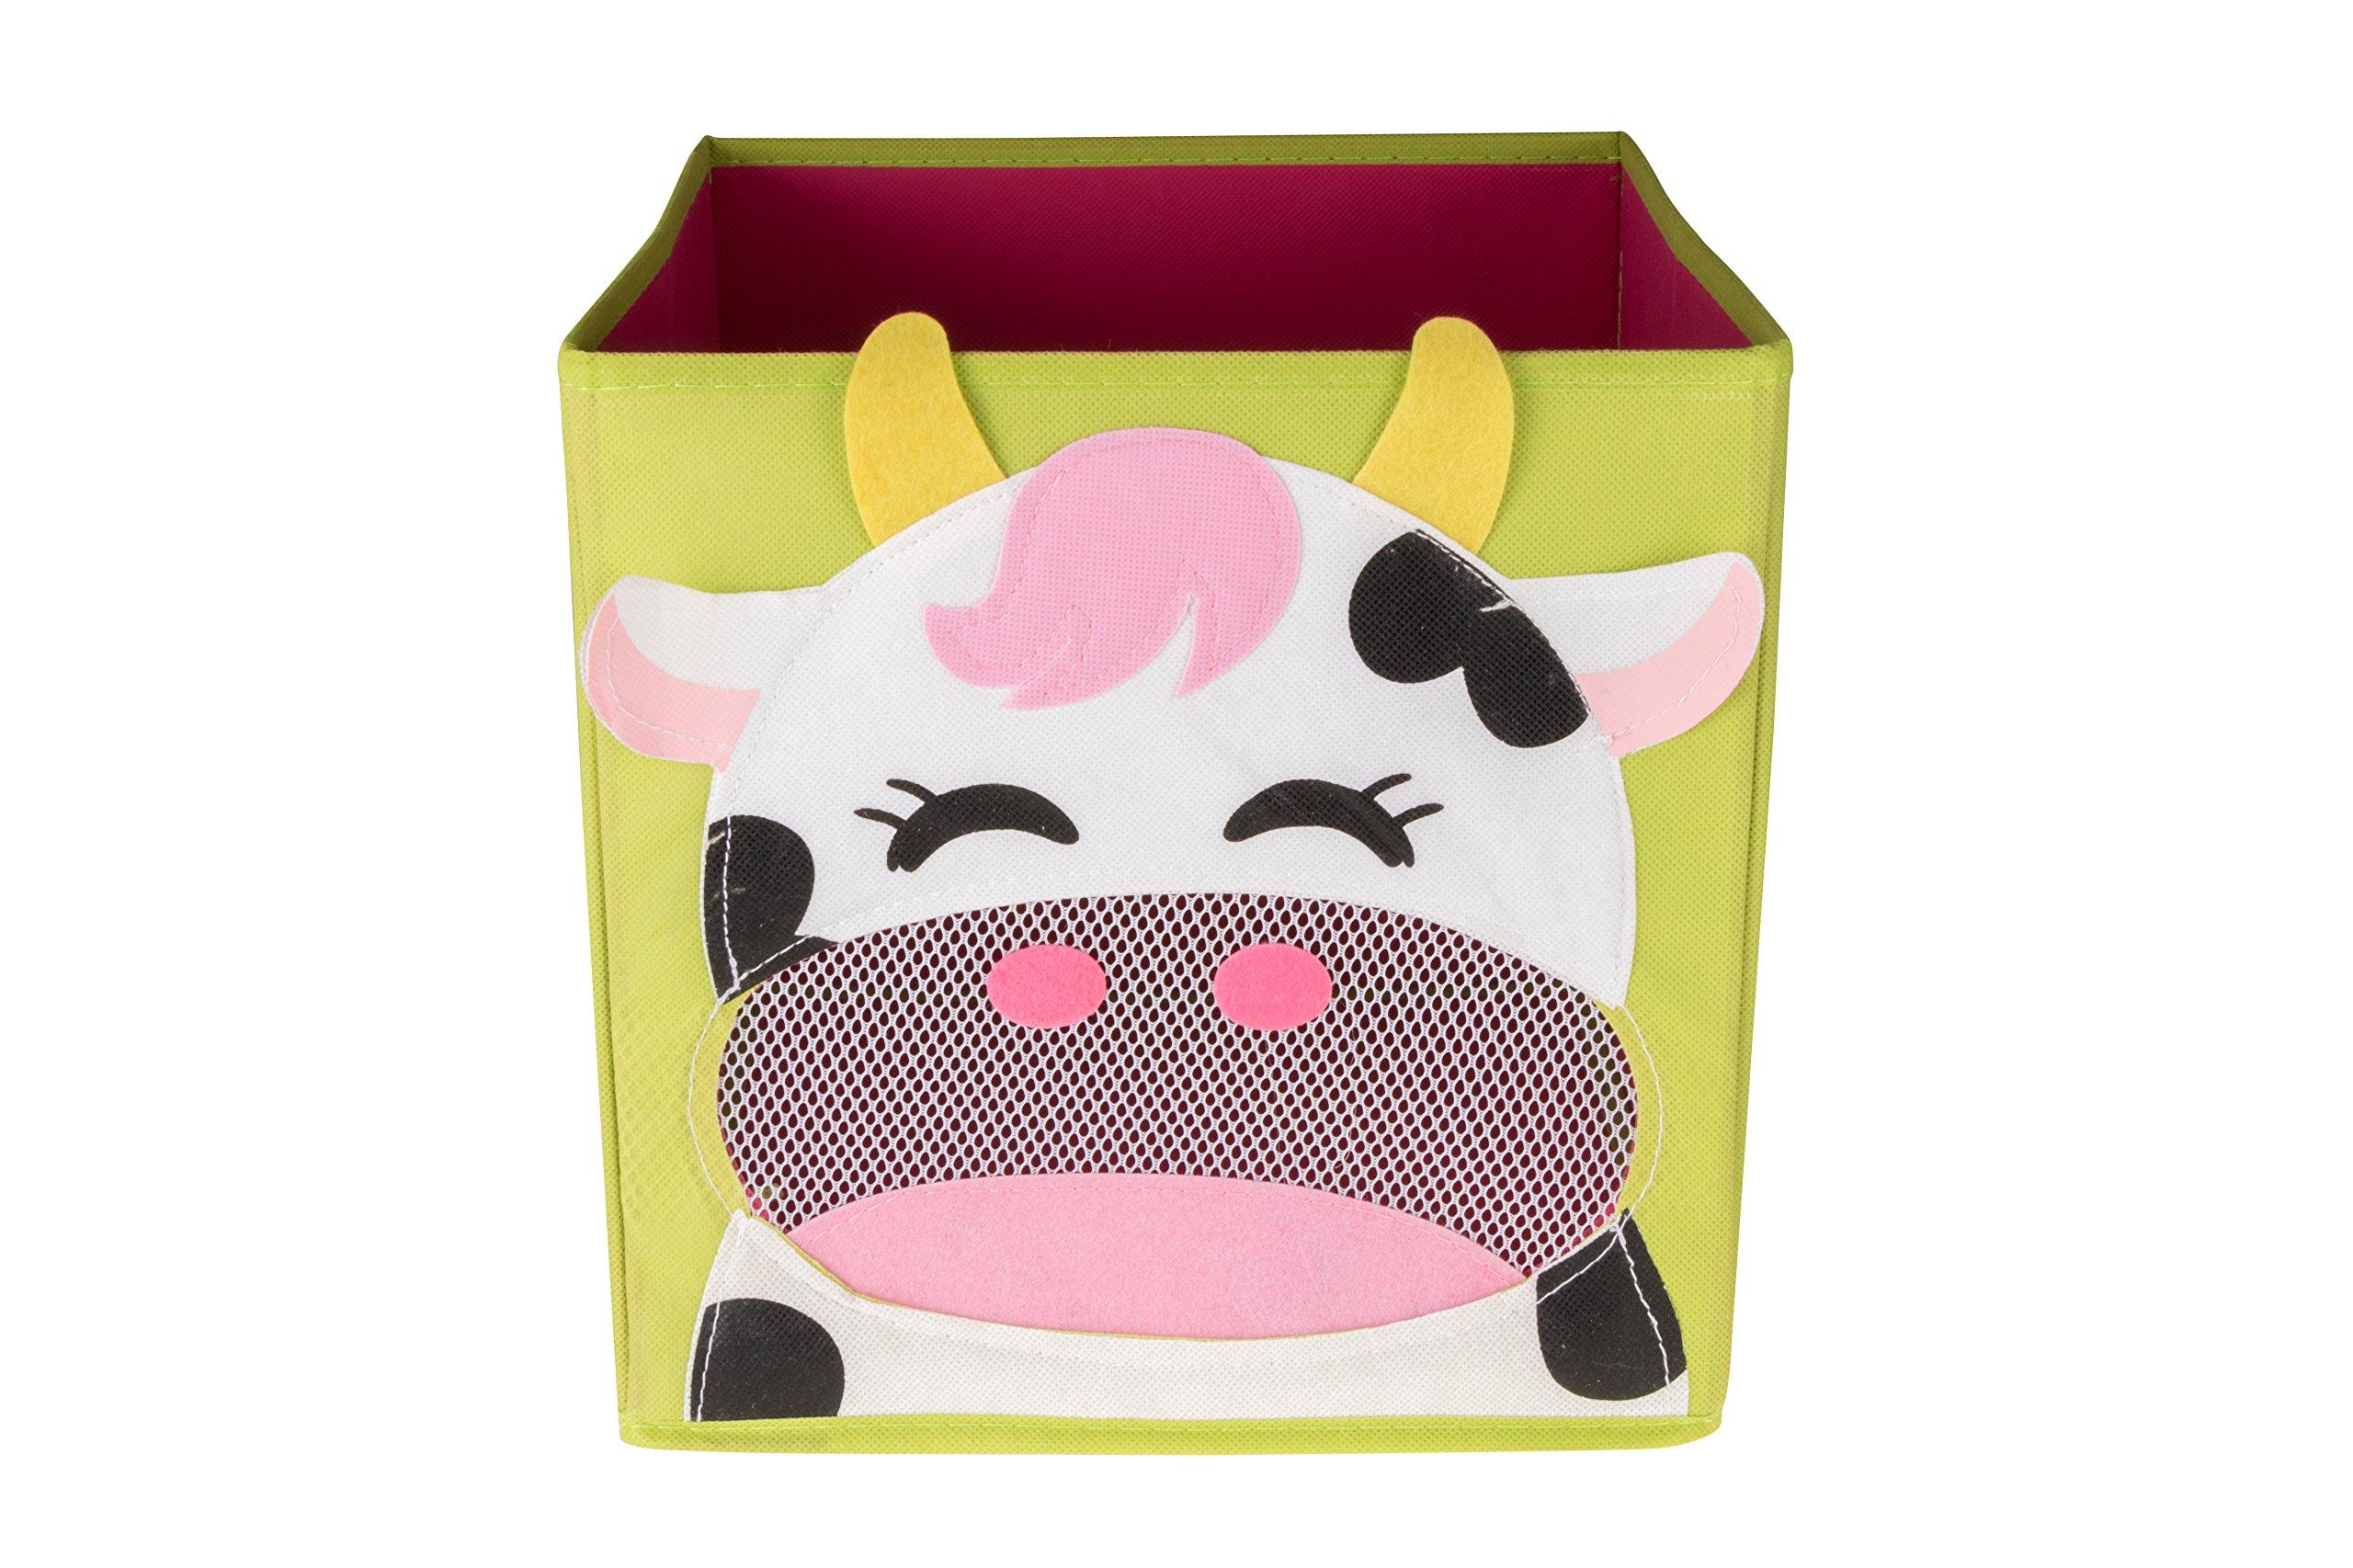 Newstyle foldable kids 39 toy storage bin box for Baby clothes size organizer